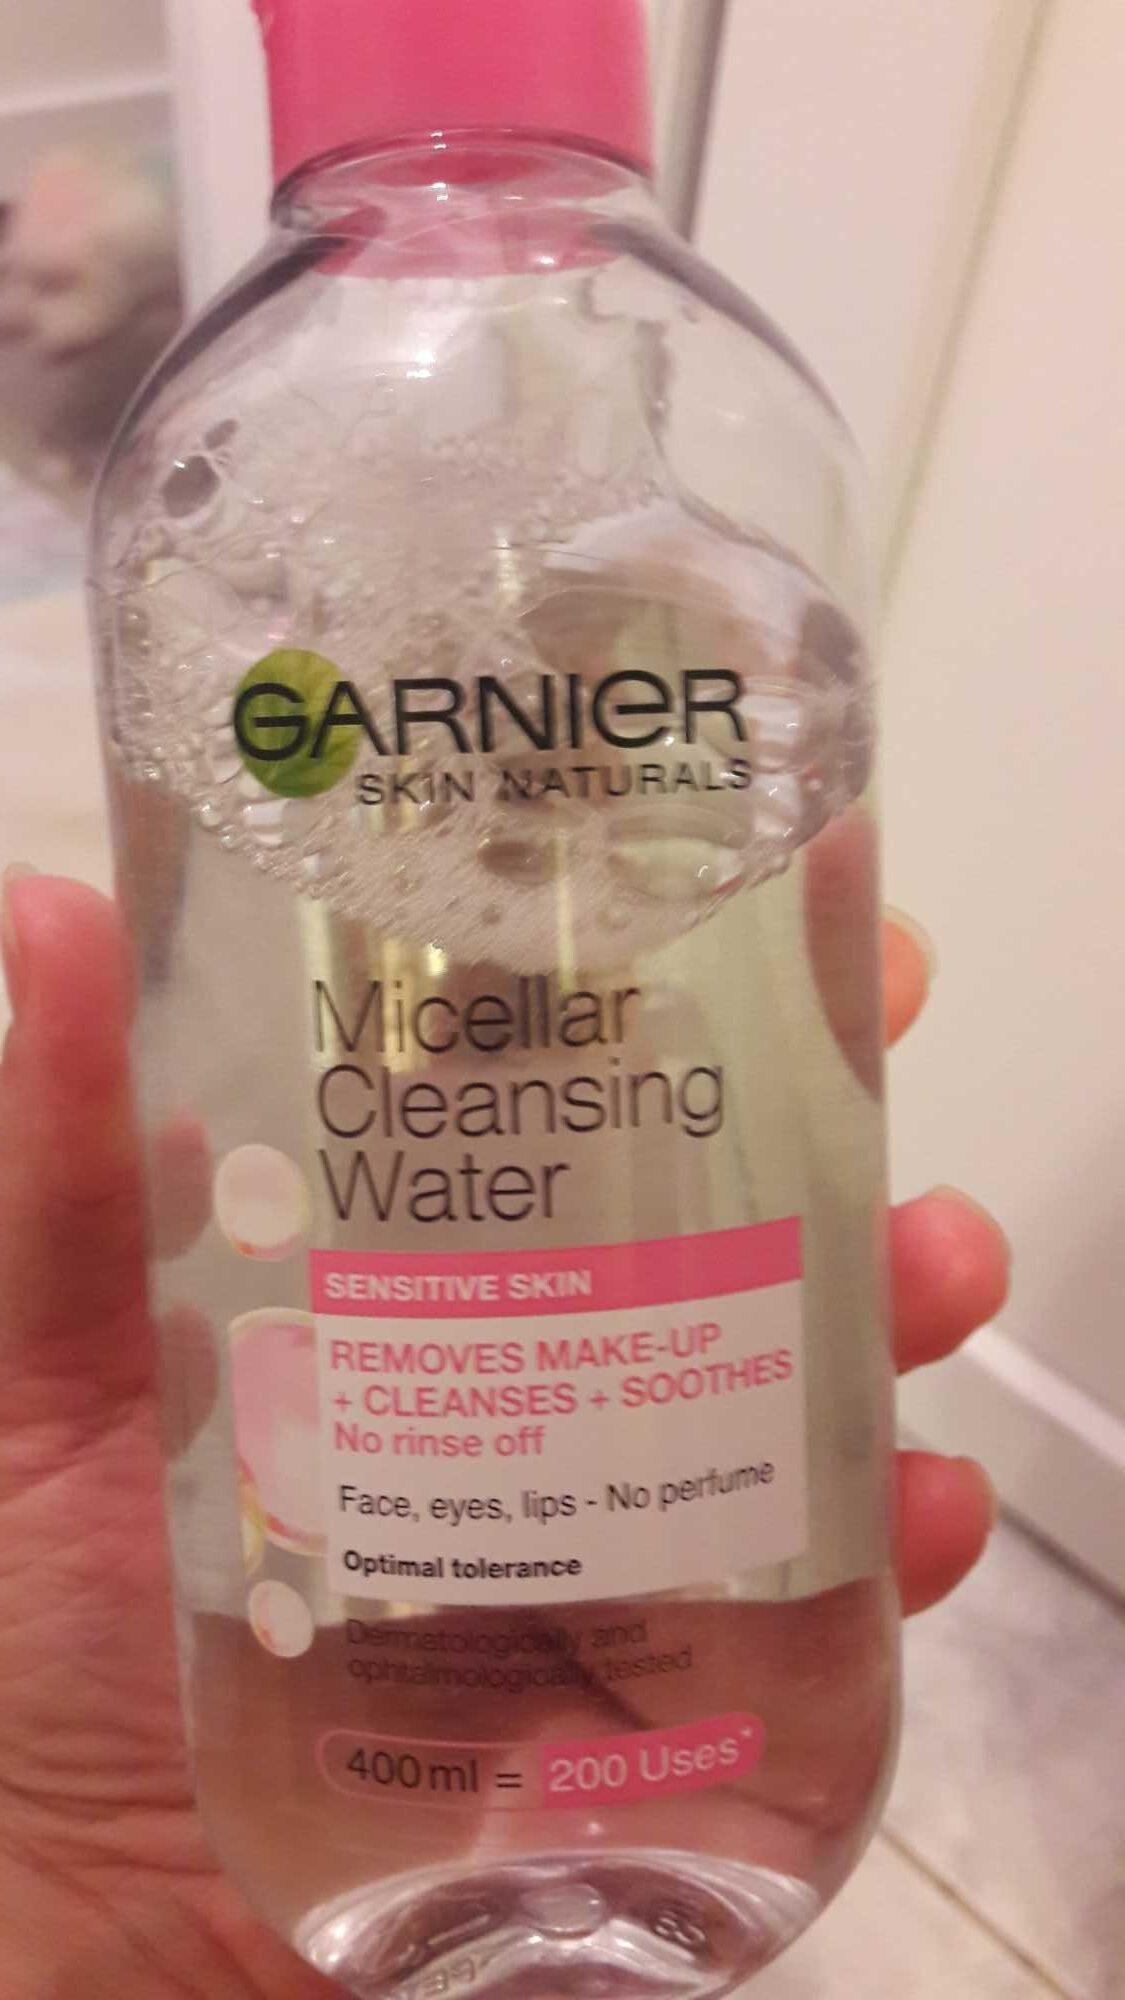 Garnier - Product